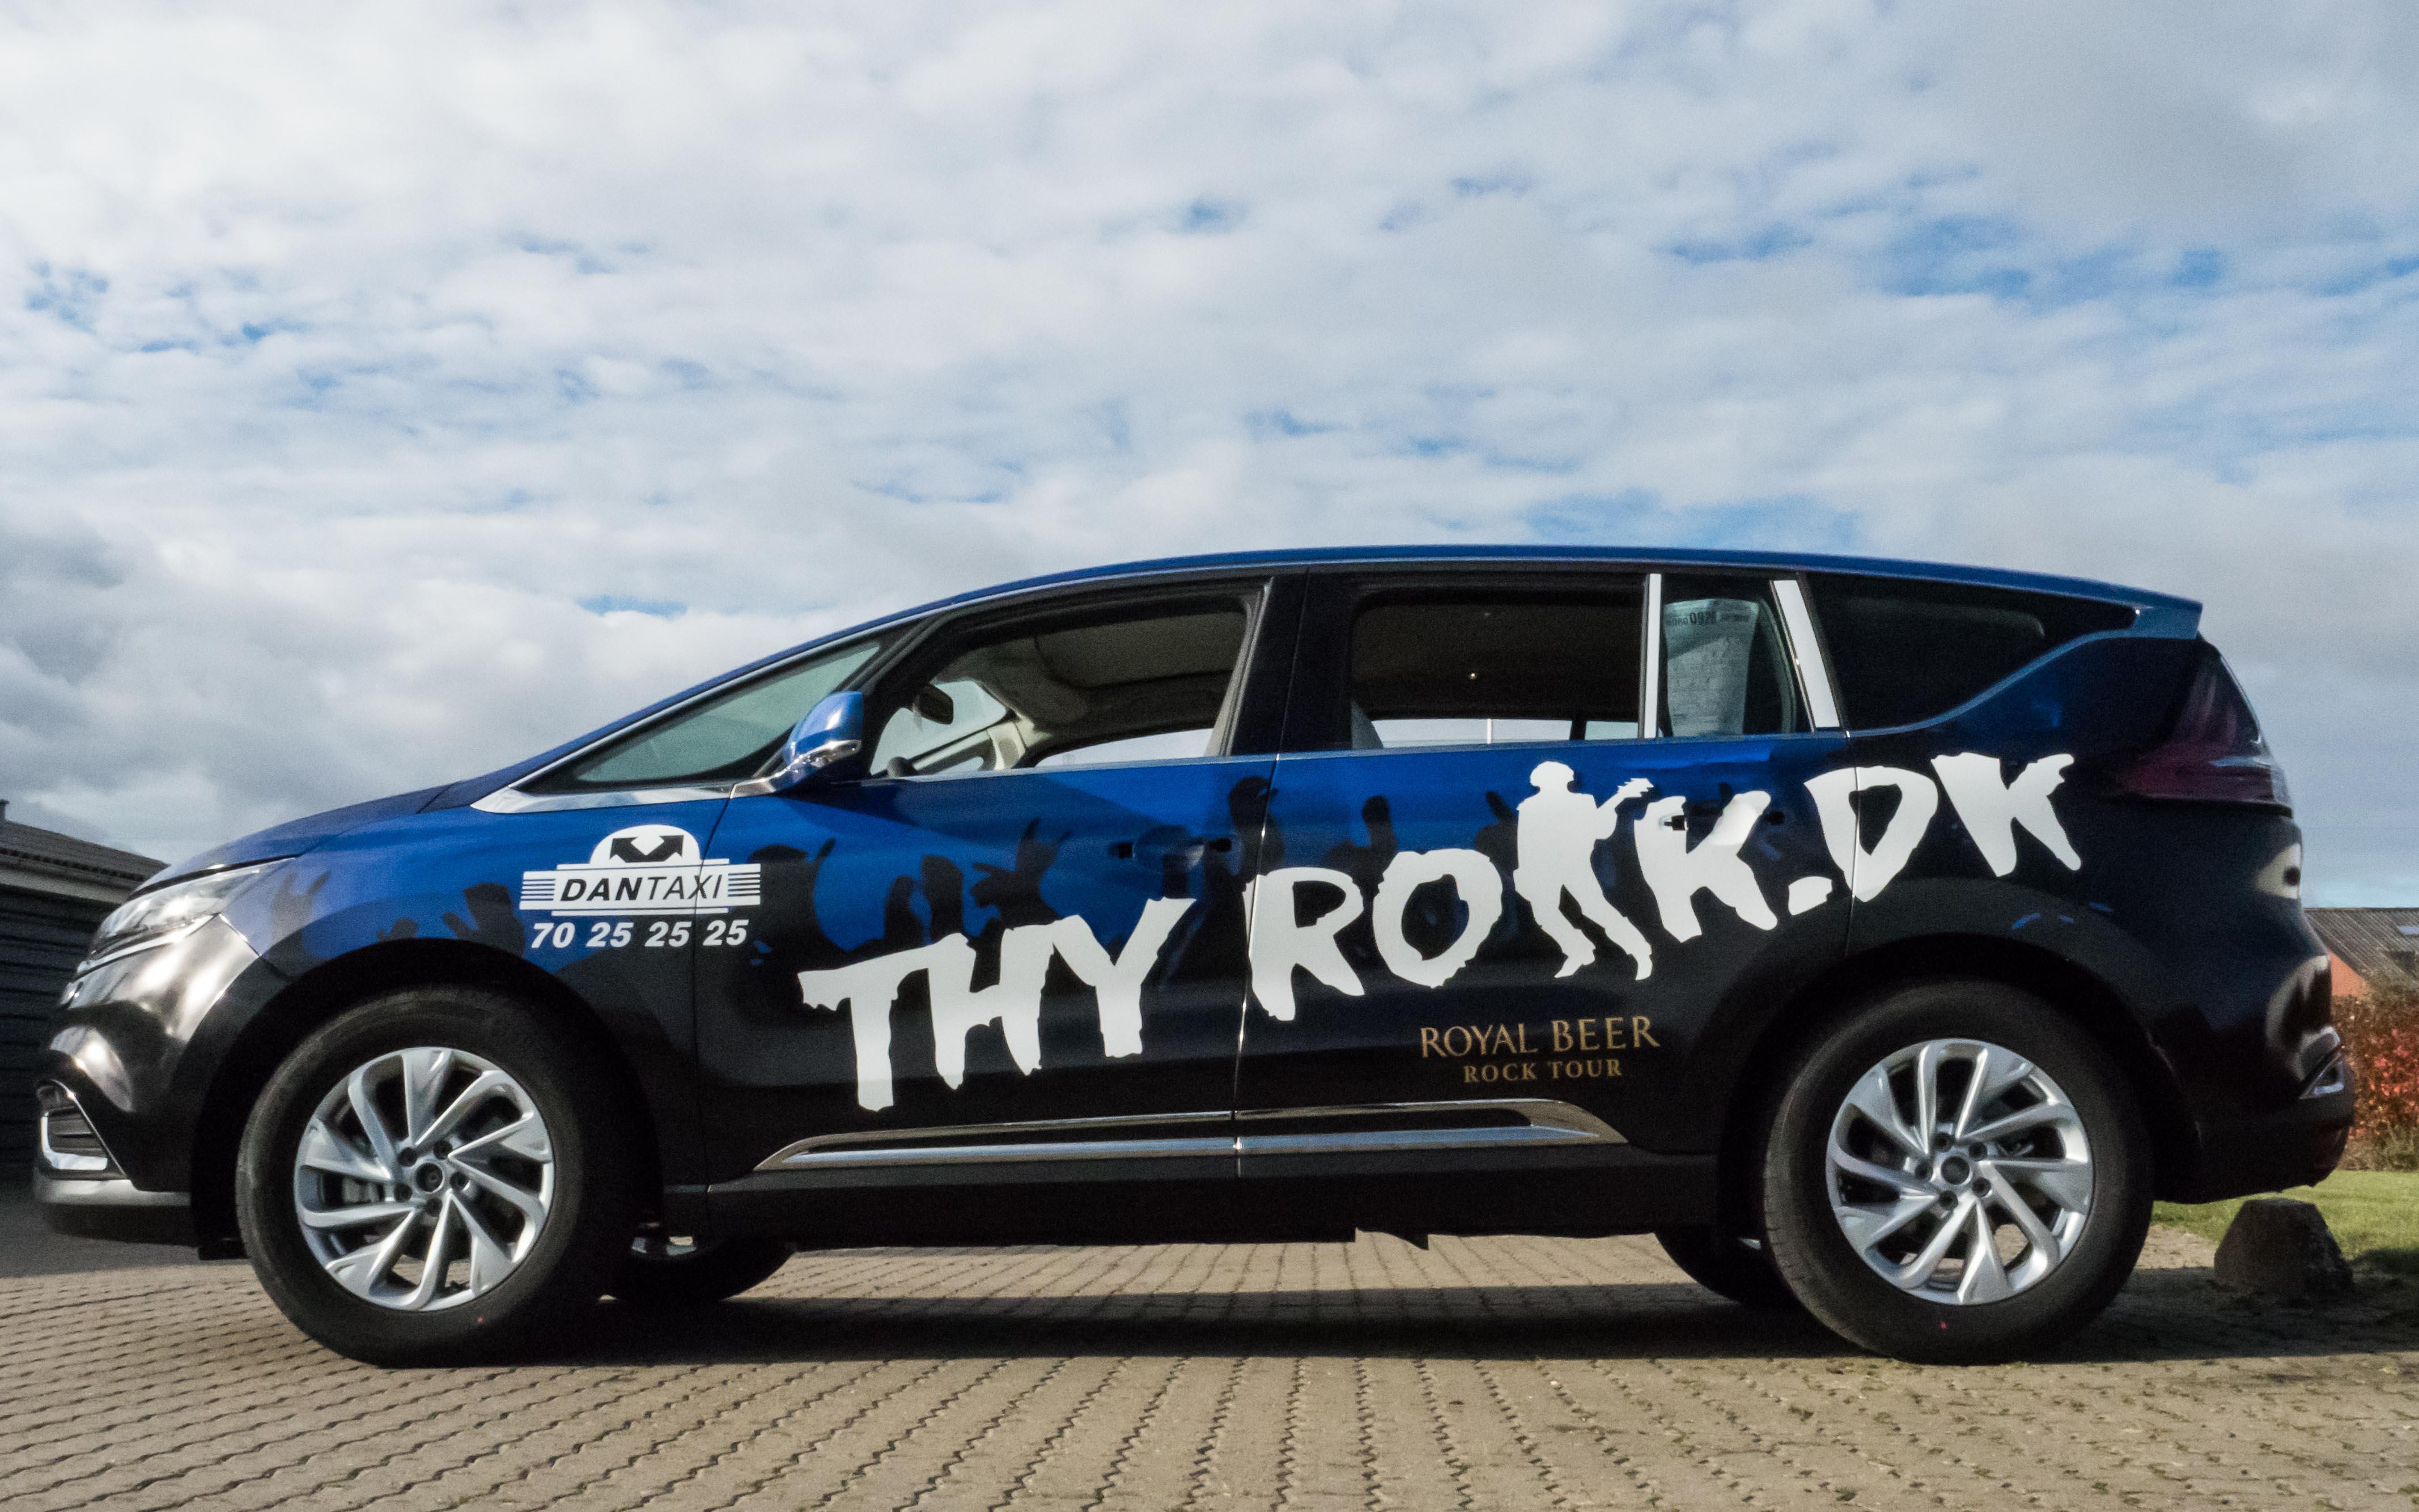 Thy Rock Taxi-6